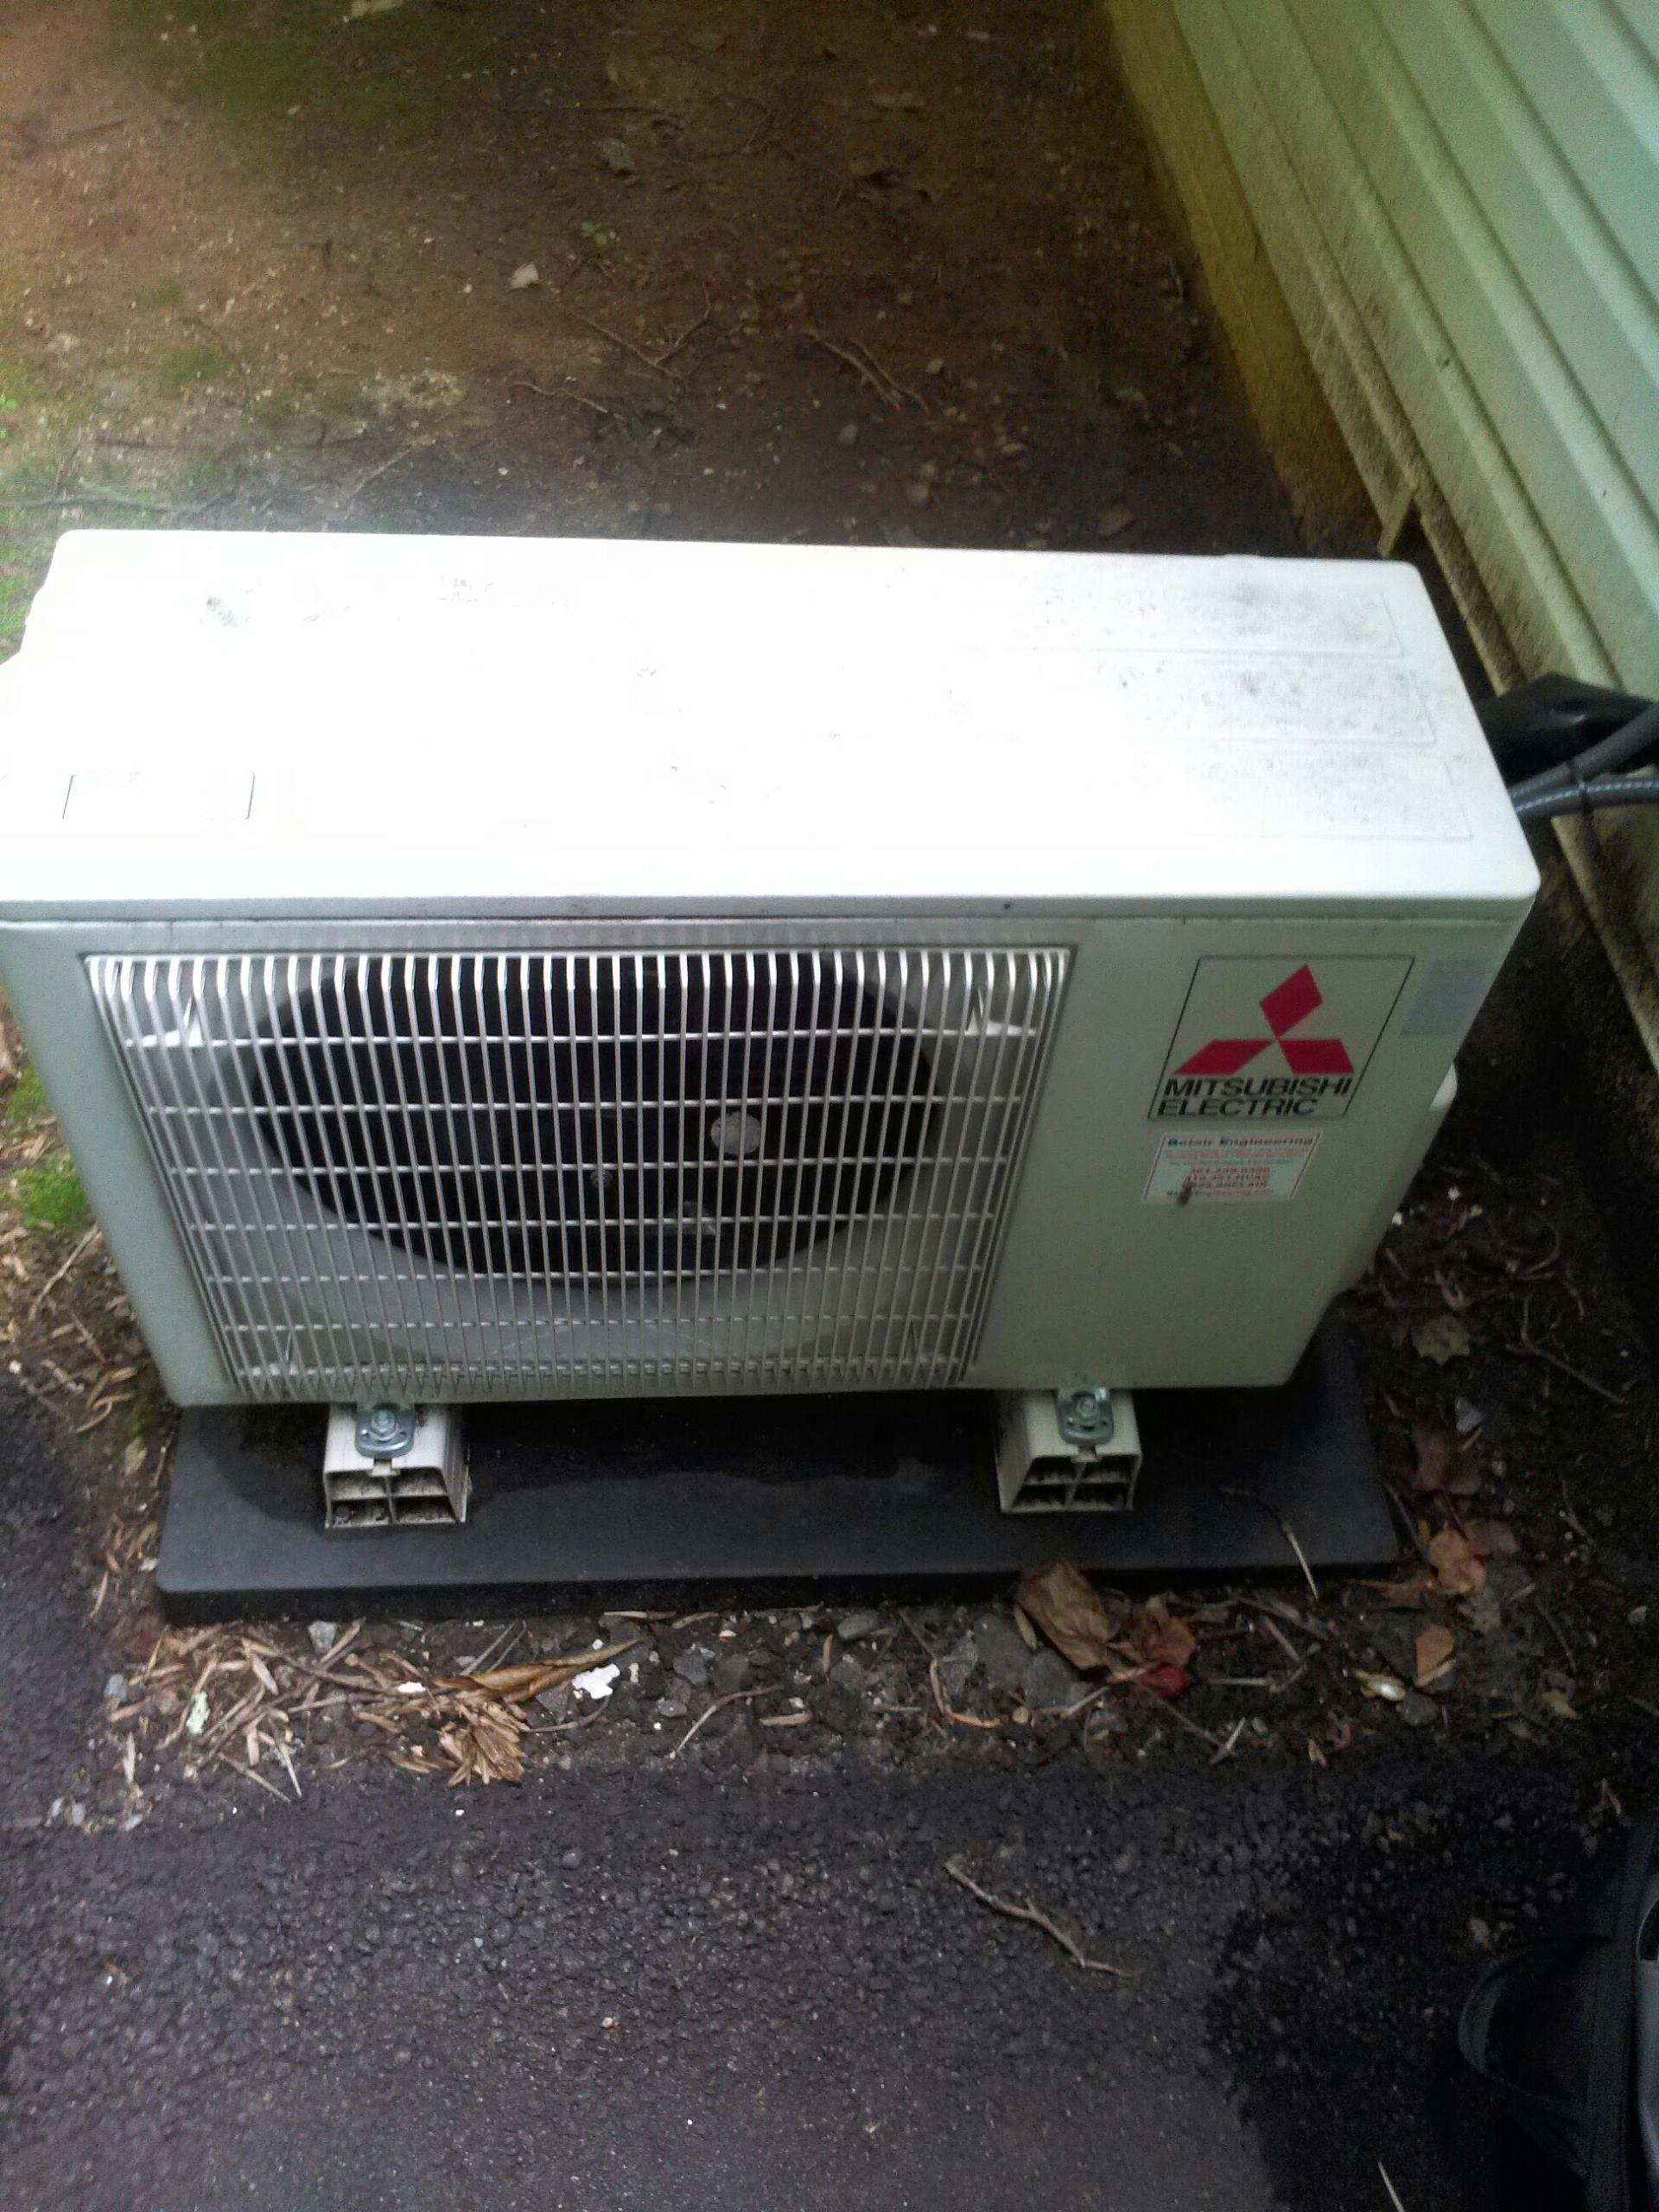 Gambrills, MD - Mitsubishi heat pump ac air conditioning & heating system installation repair service call Gambrills MD